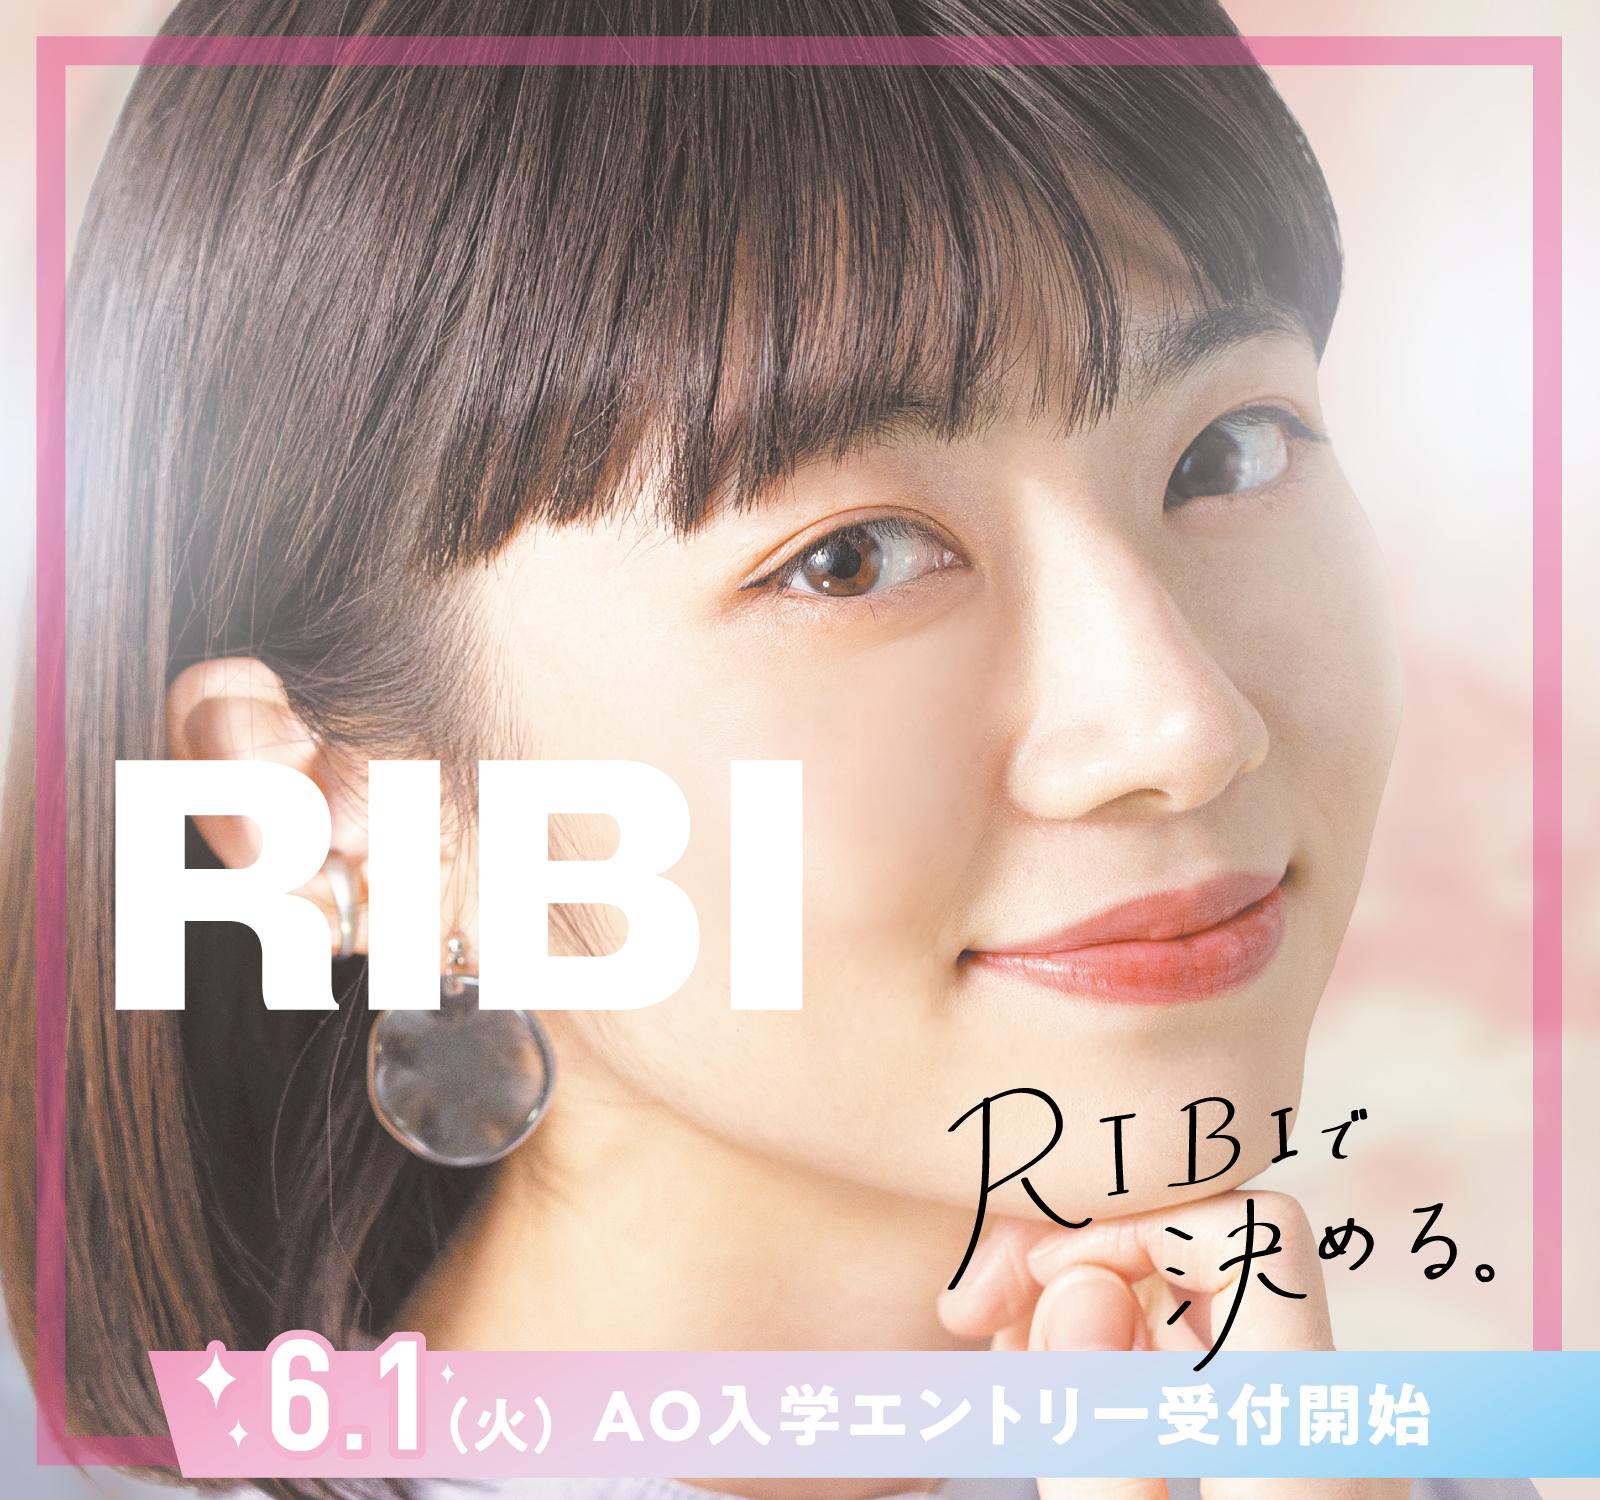 RIBIで決める